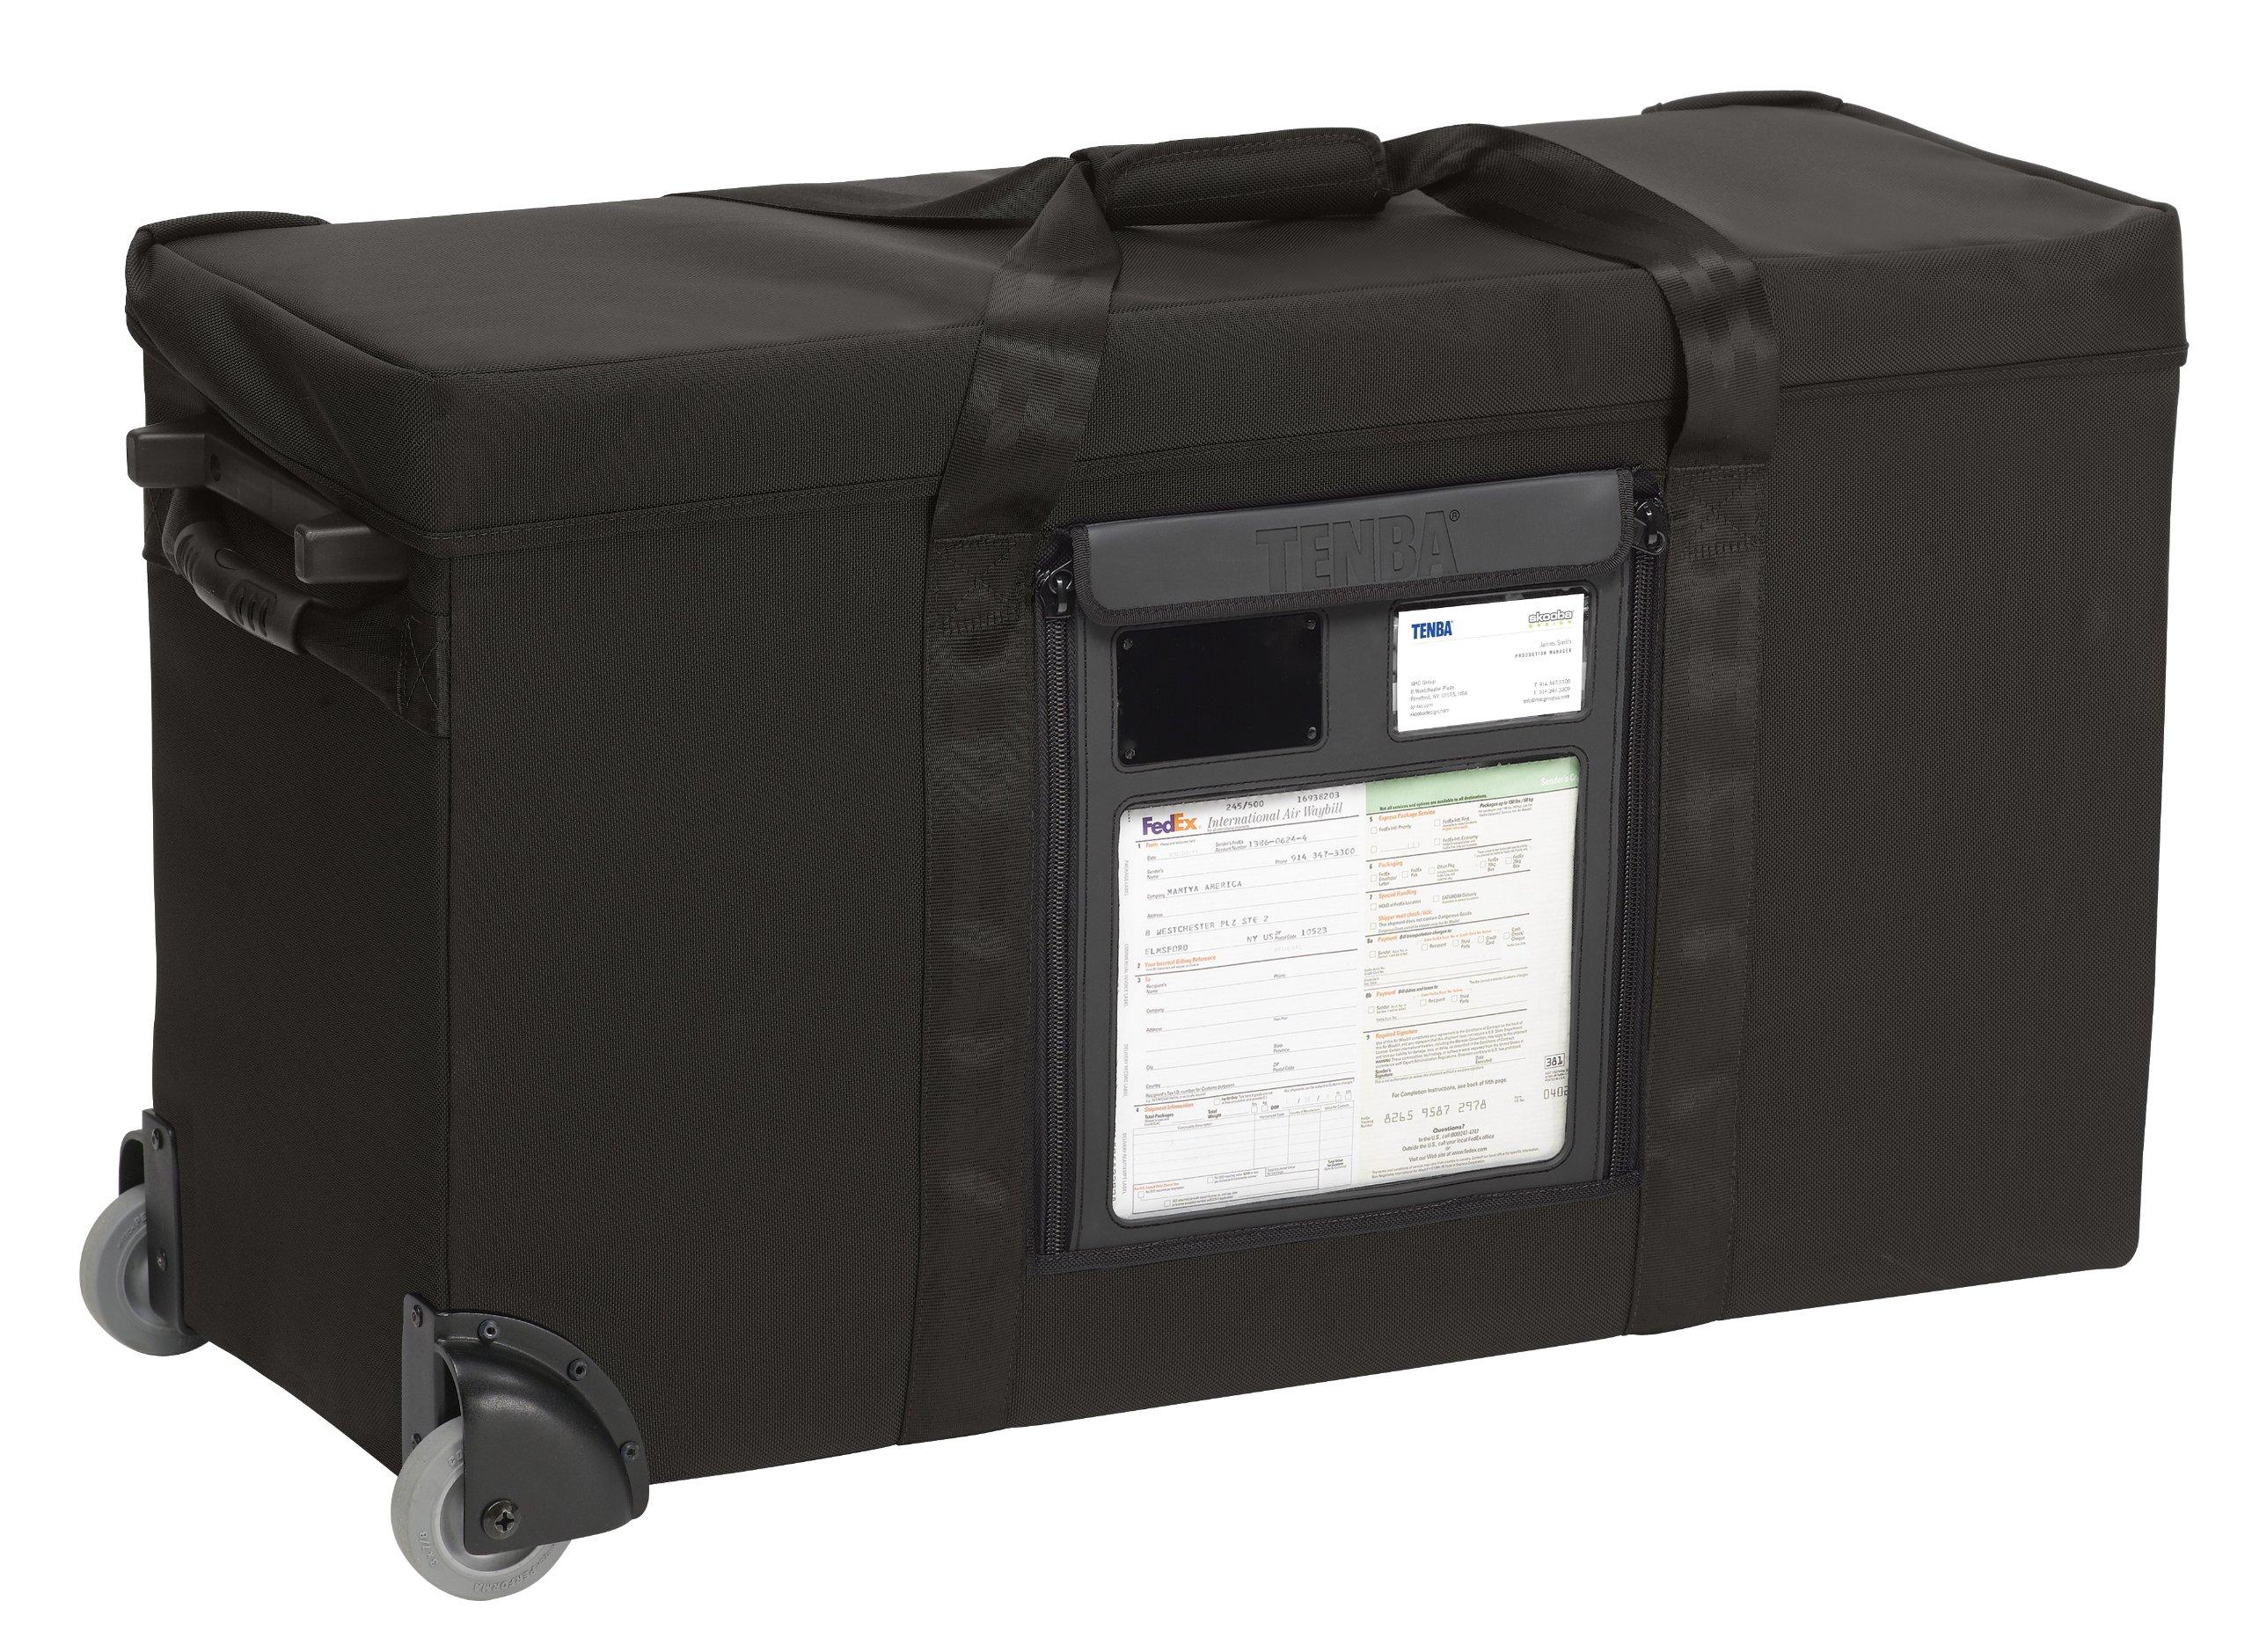 Tenba AW-MLC Medium Light Air Case with Wheels (634-142)